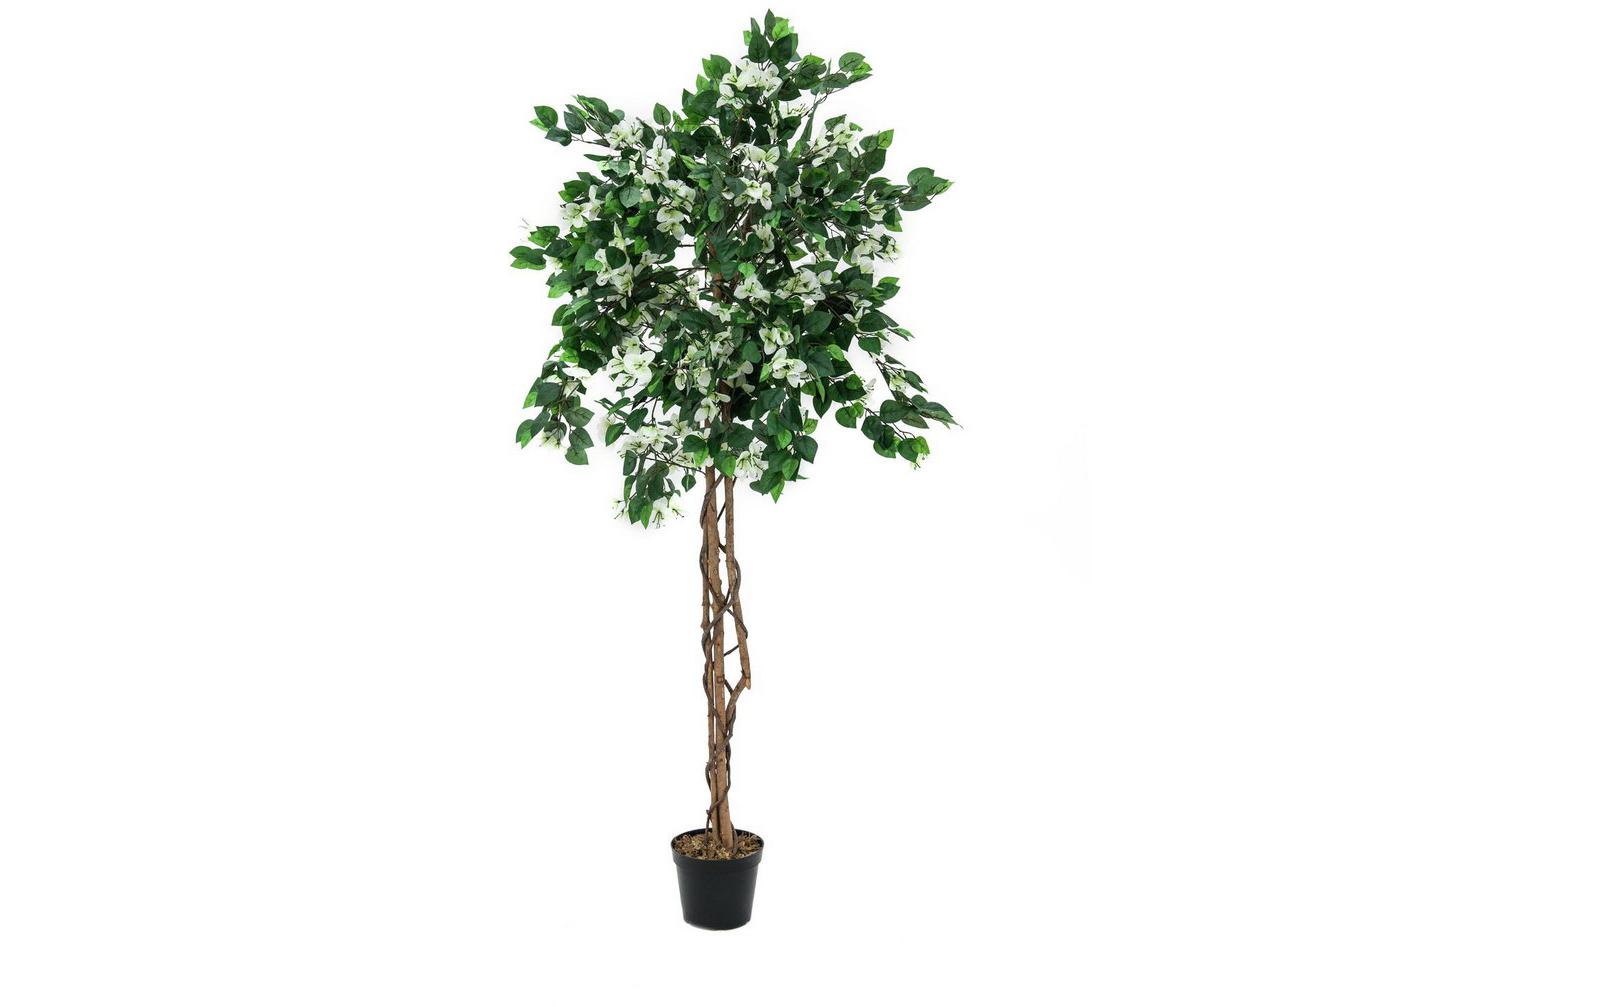 europalms-bougainvillea-weiay-150cm-kunststoffpflanze